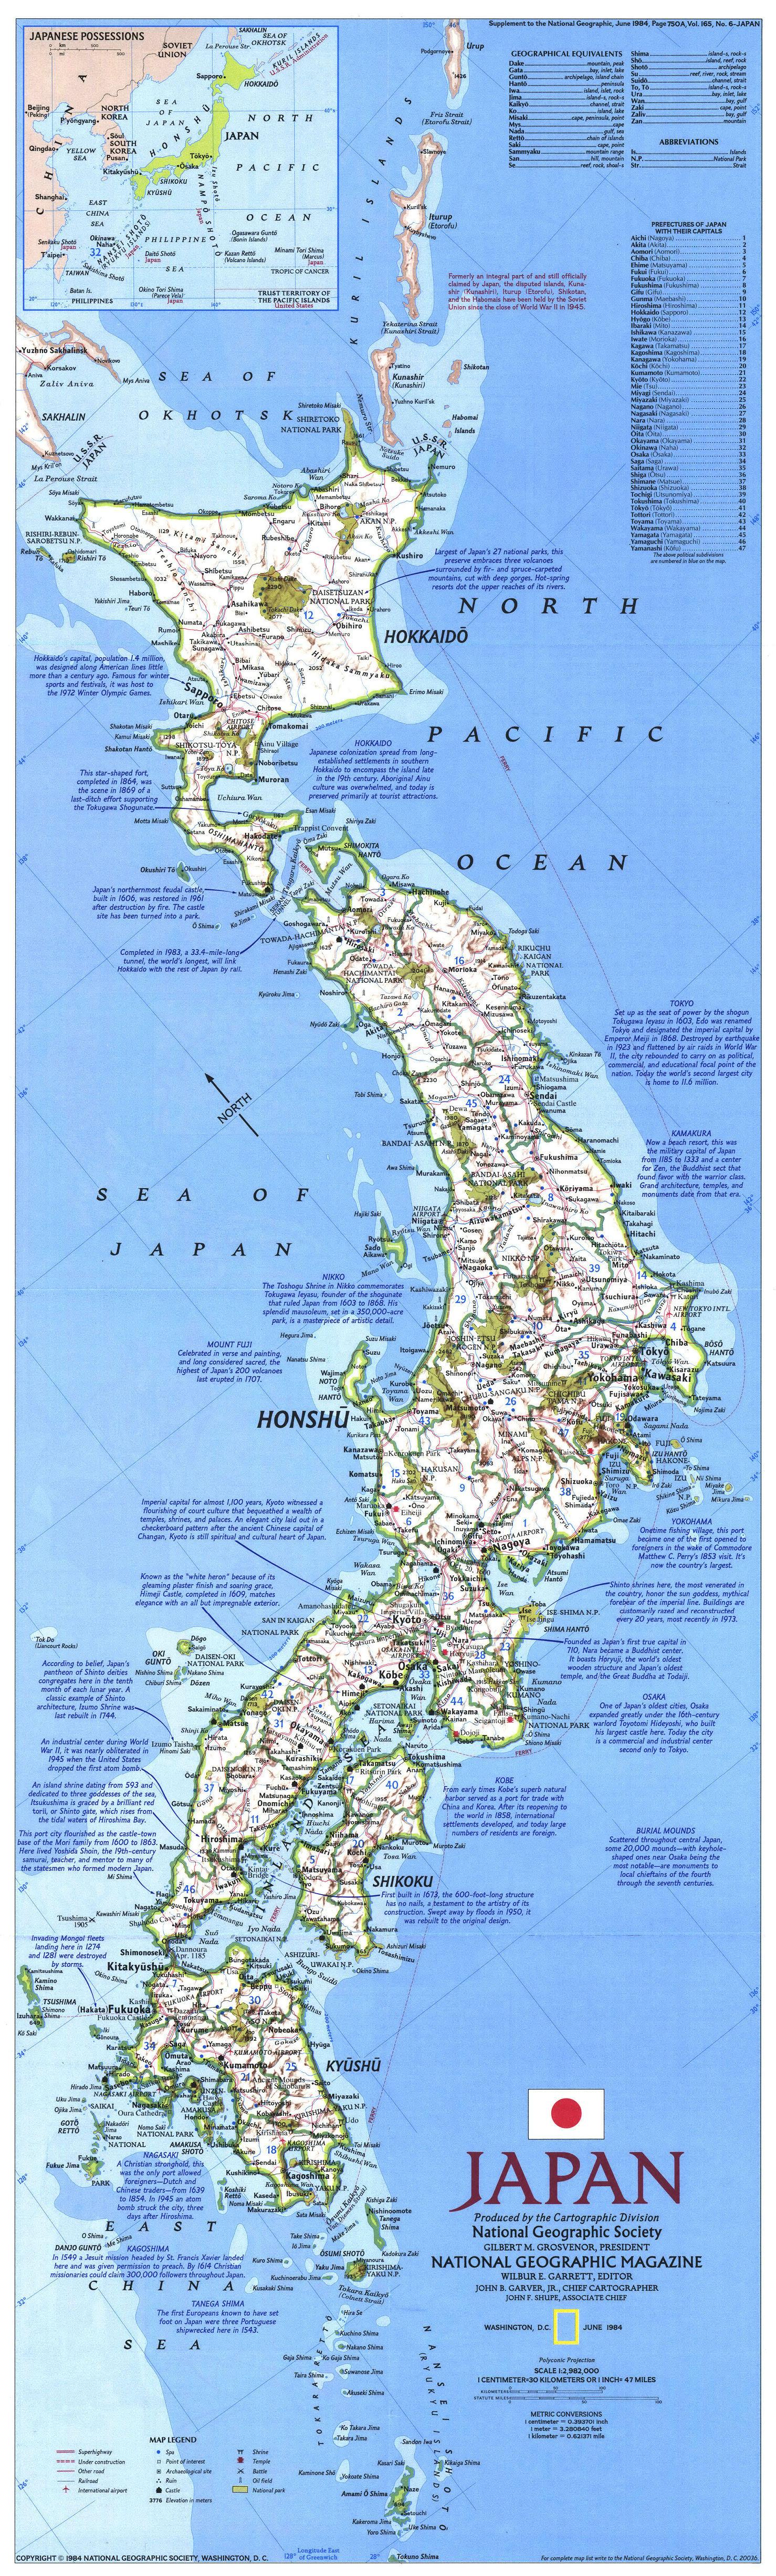 Japan Honshu Shikoku Kyushu And Hokkaido Japan Is